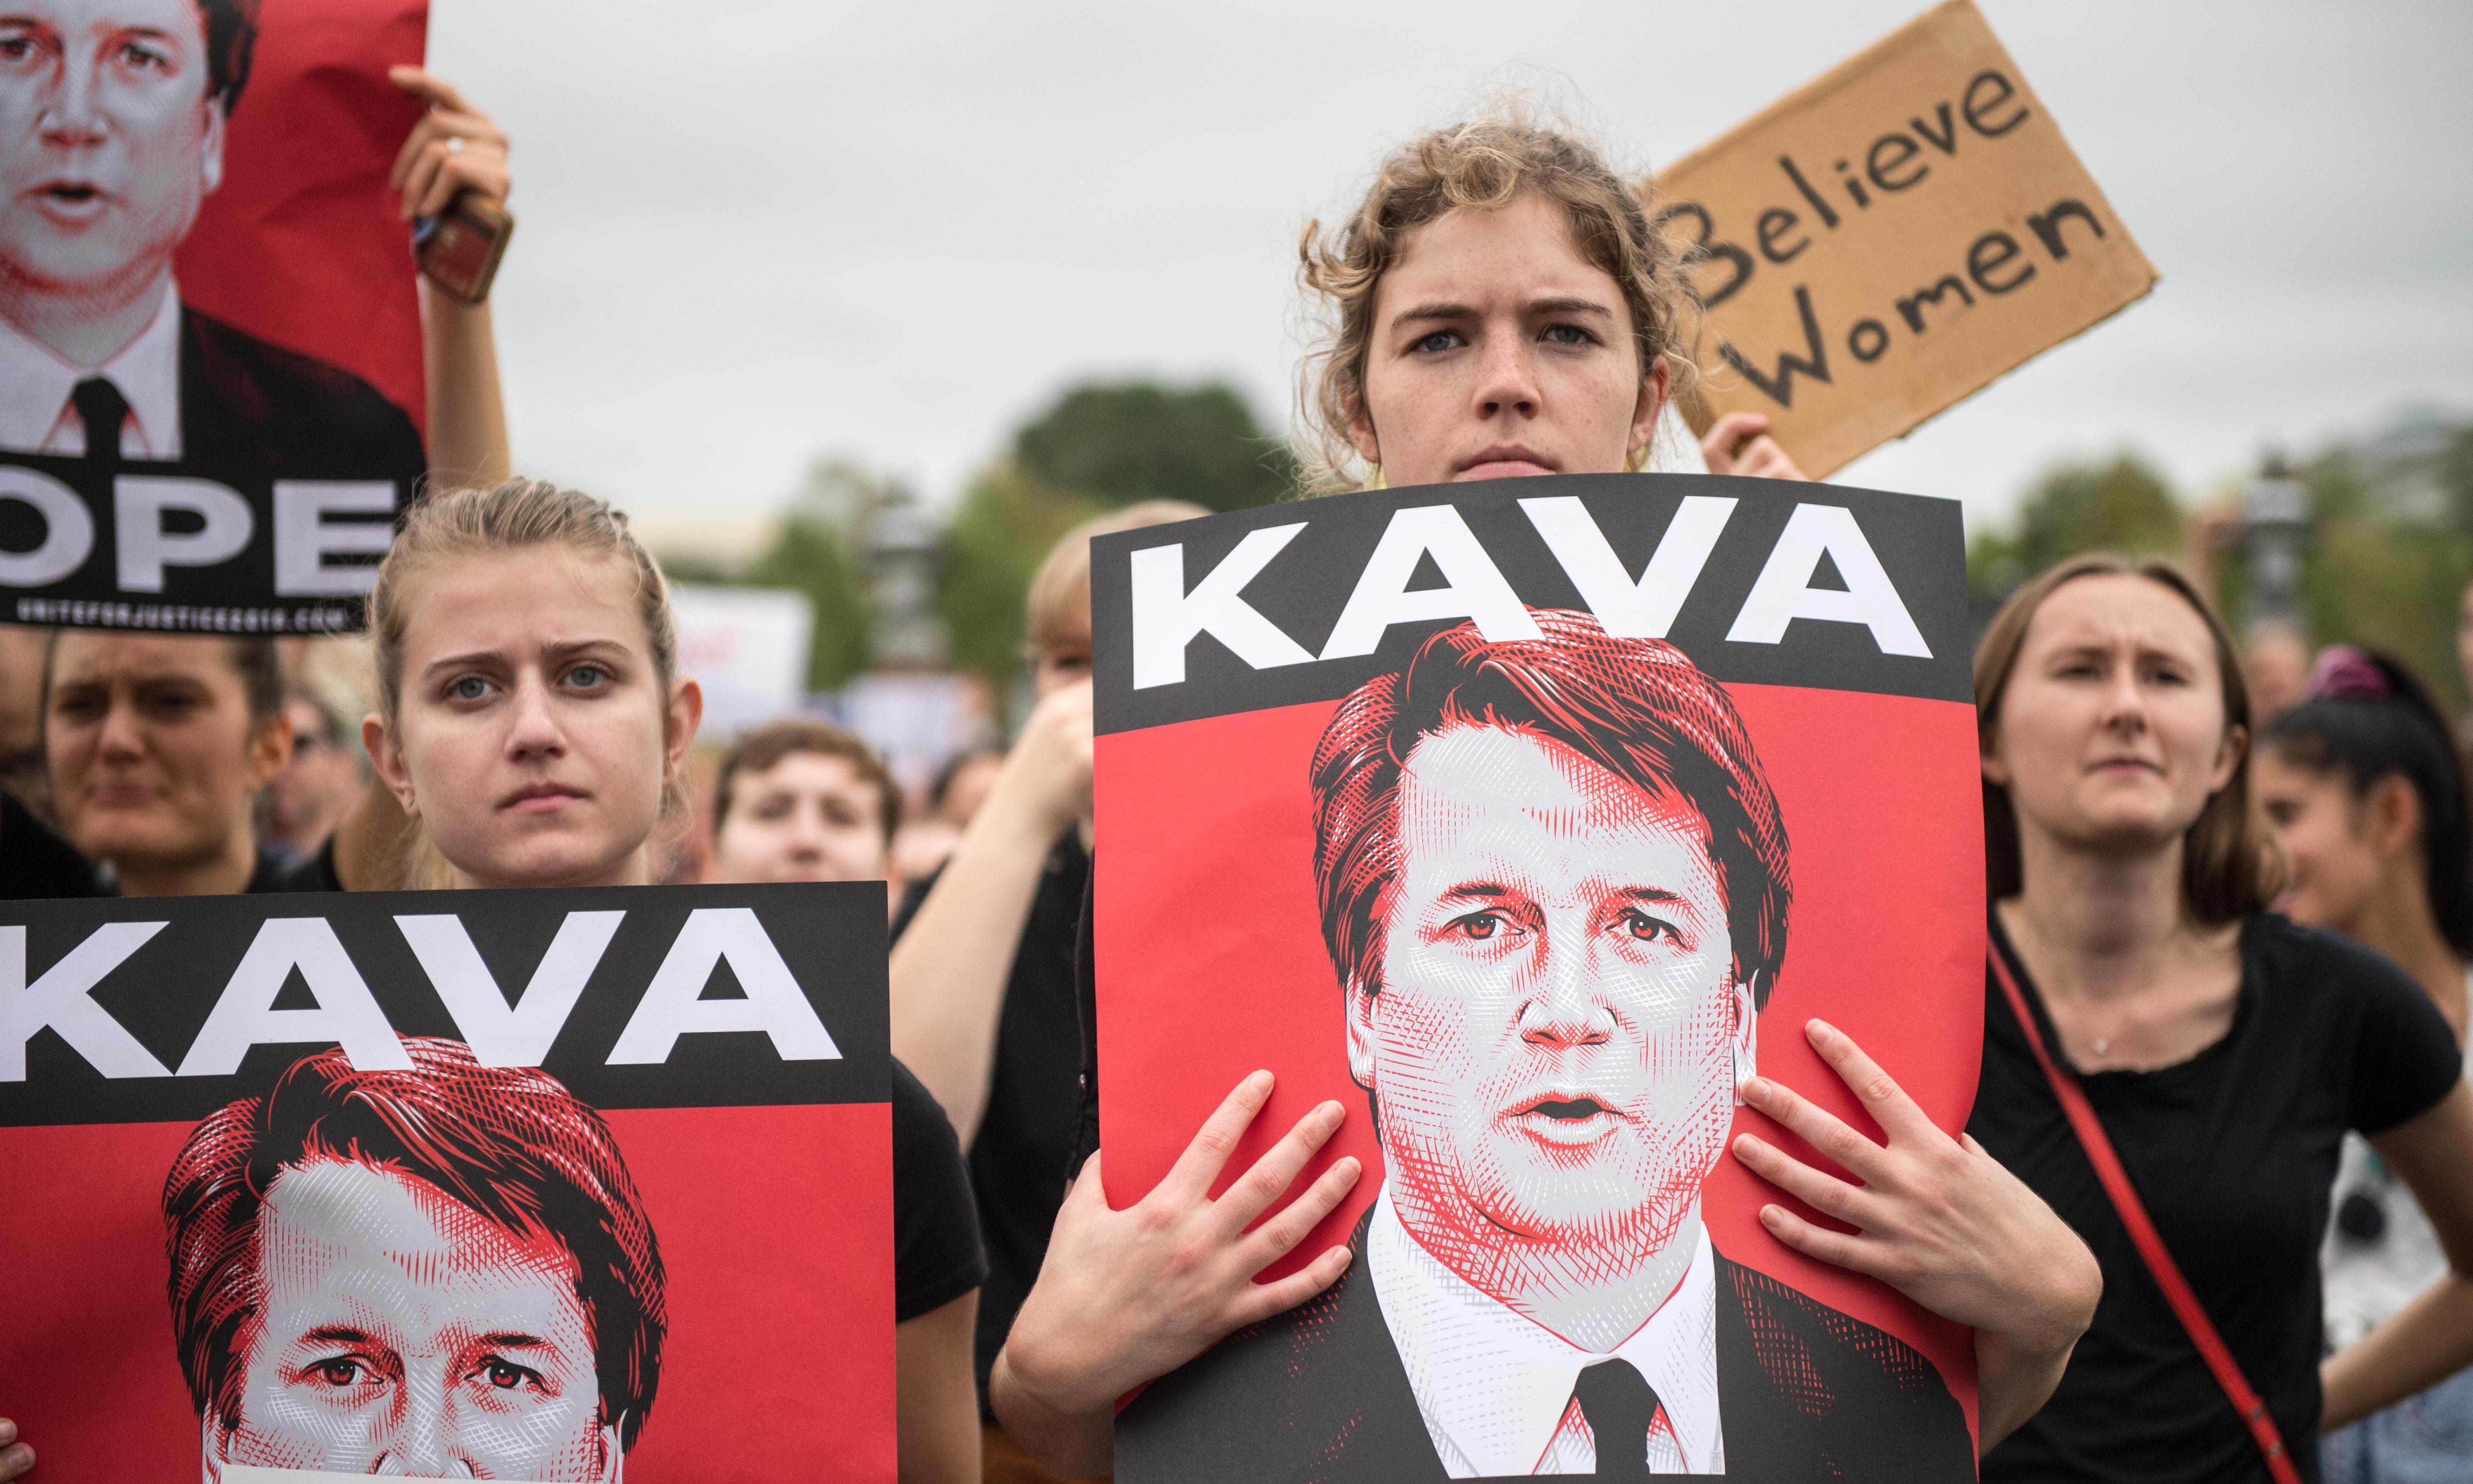 The Brett Kavanaugh travesty will breed a formidable backlash